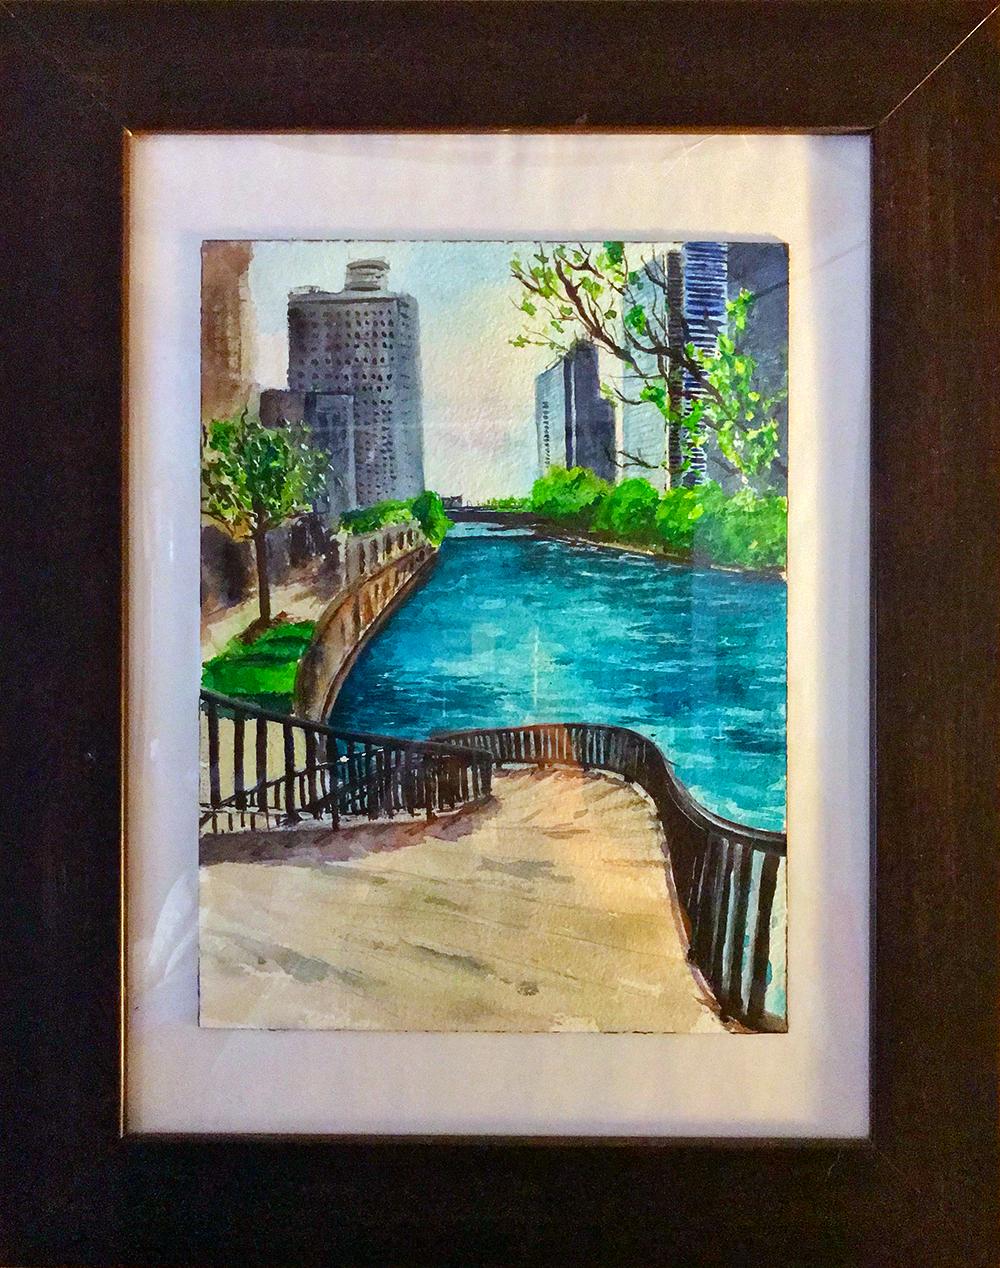 Chicago River Walk Curved Steps